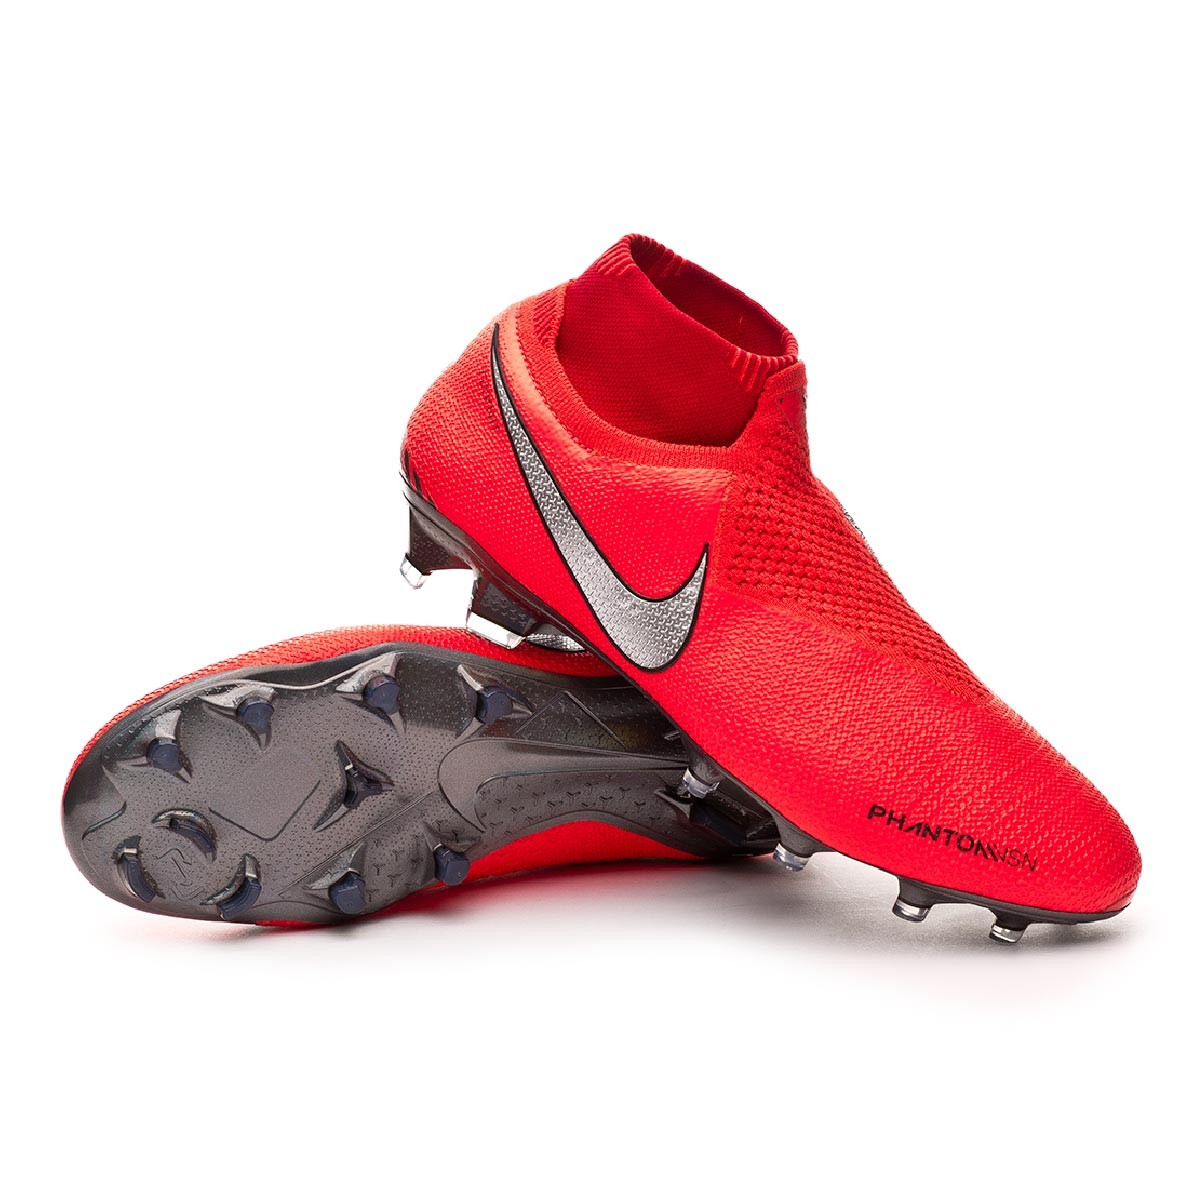 calidad autentica compra venta cupón doble Football Boots Nike Phantom Vision Elite DF FG Bright crimson ...